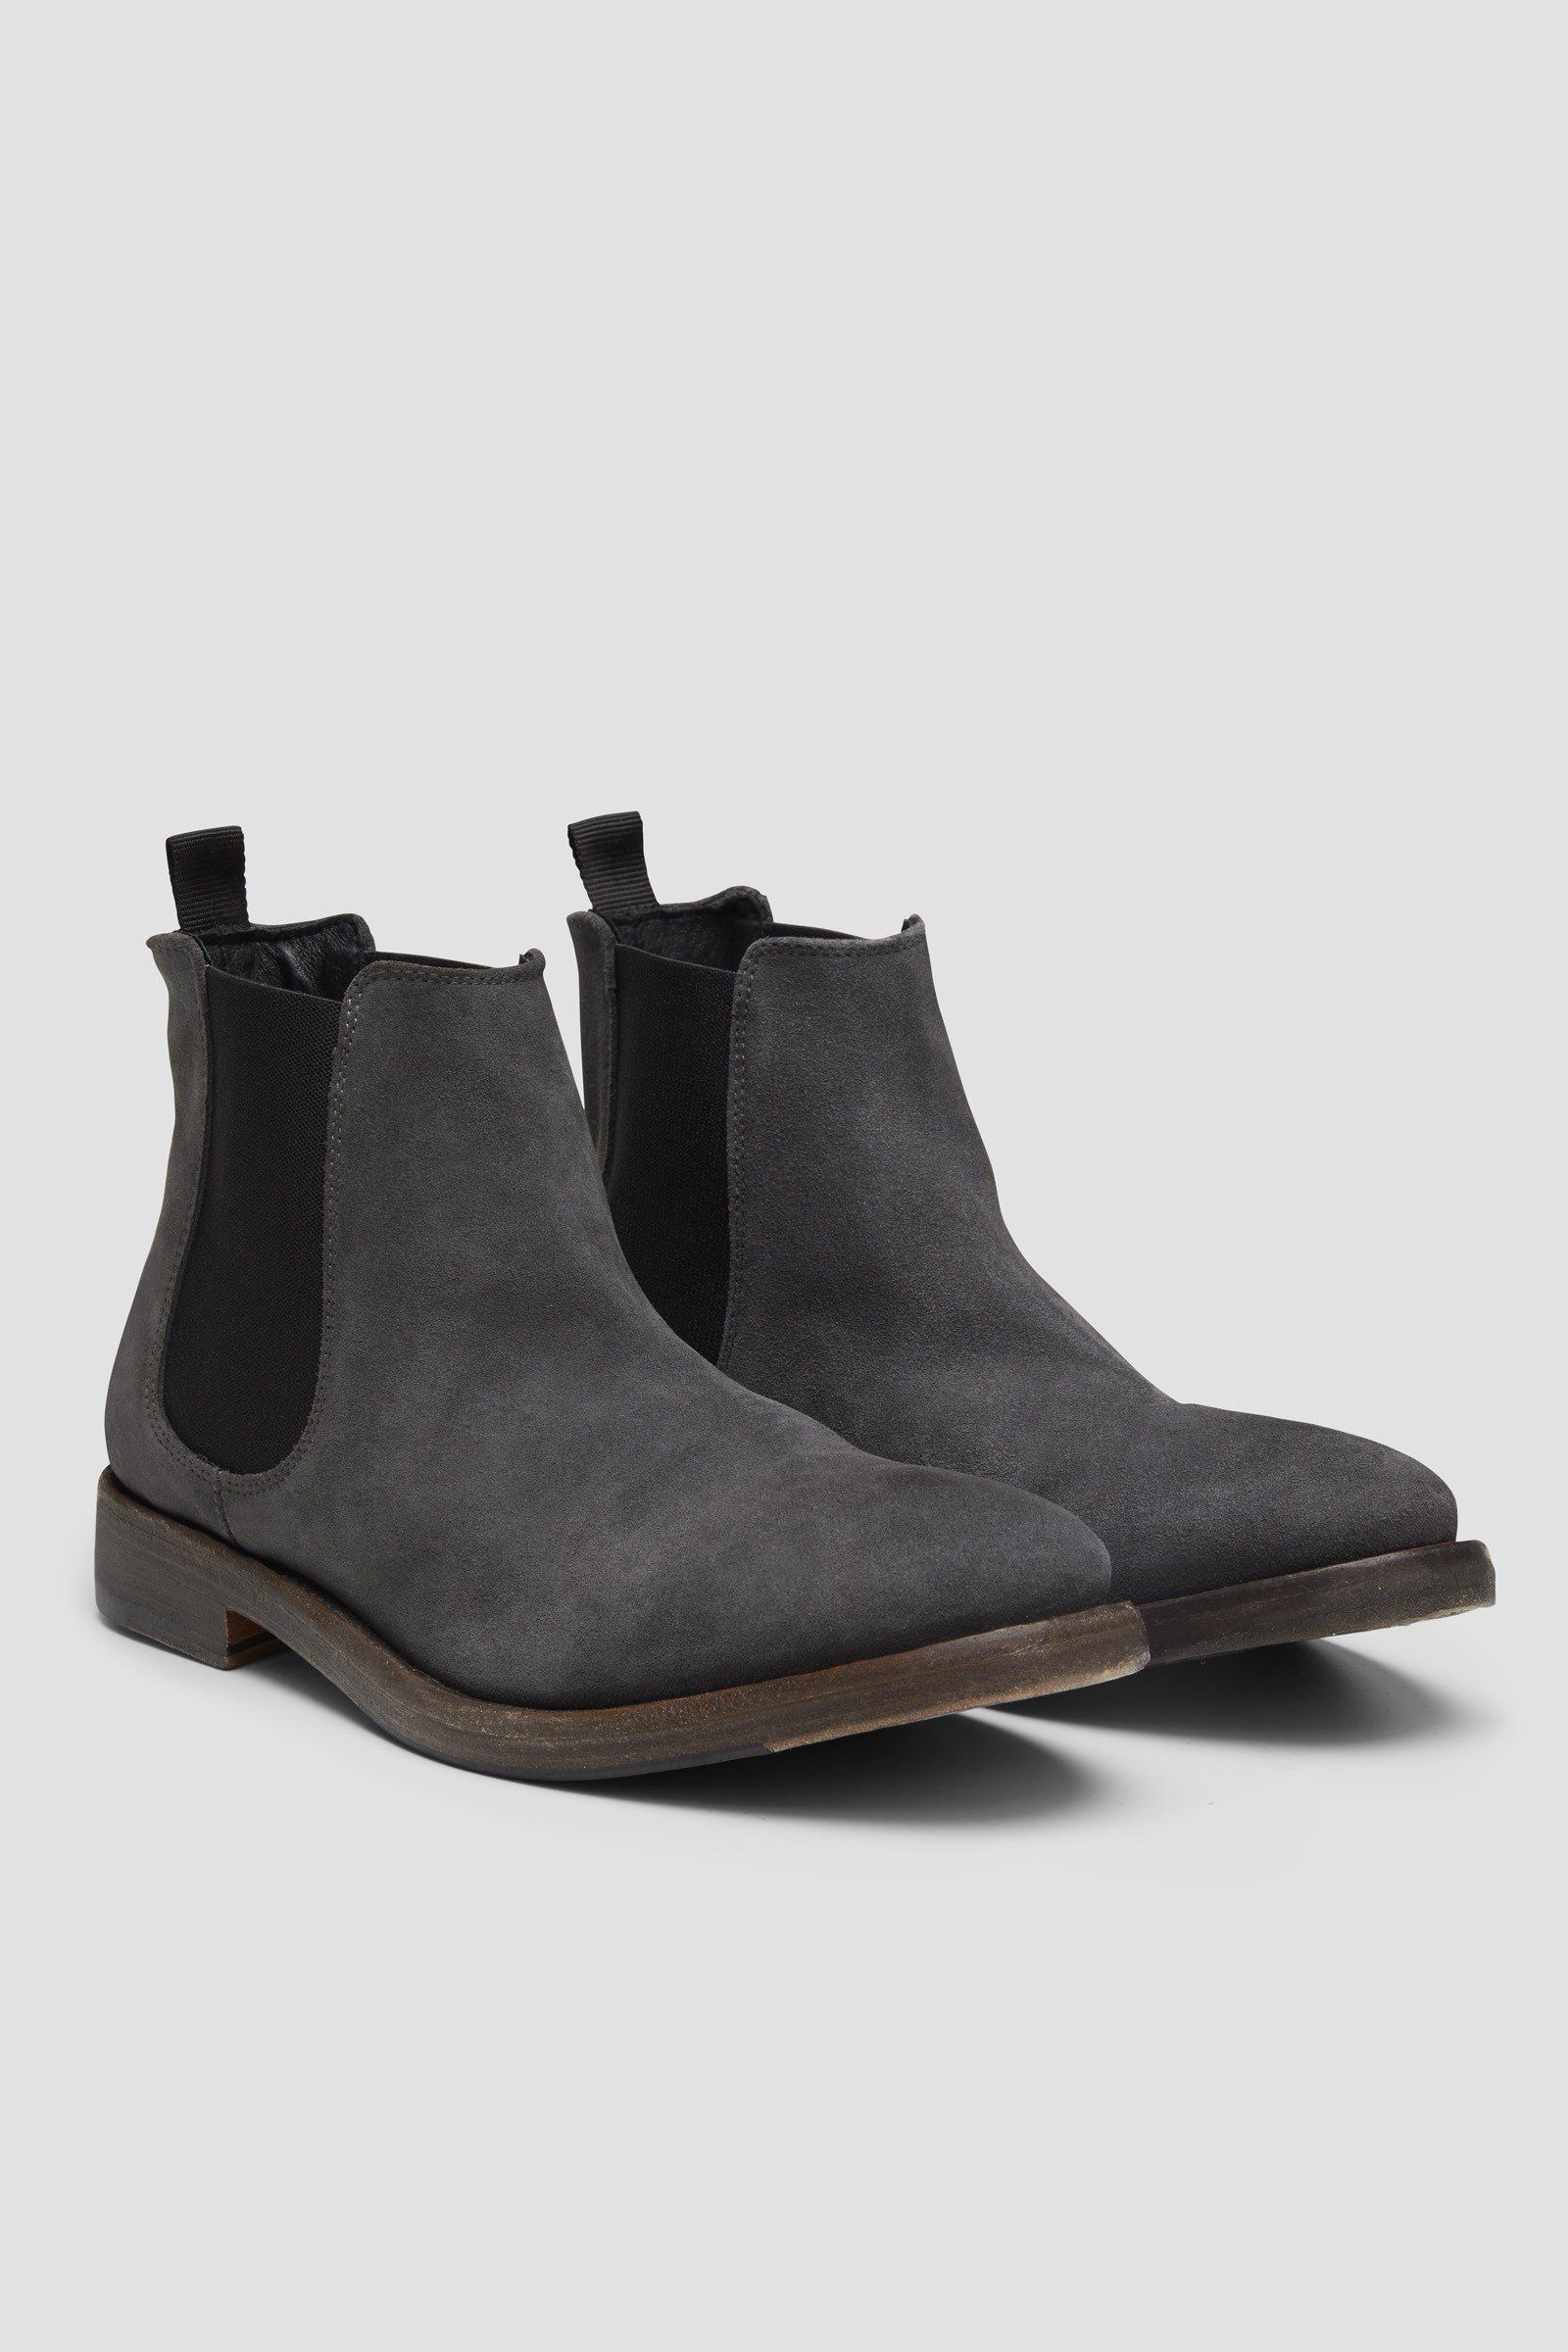 mens charcoal chelsea boots